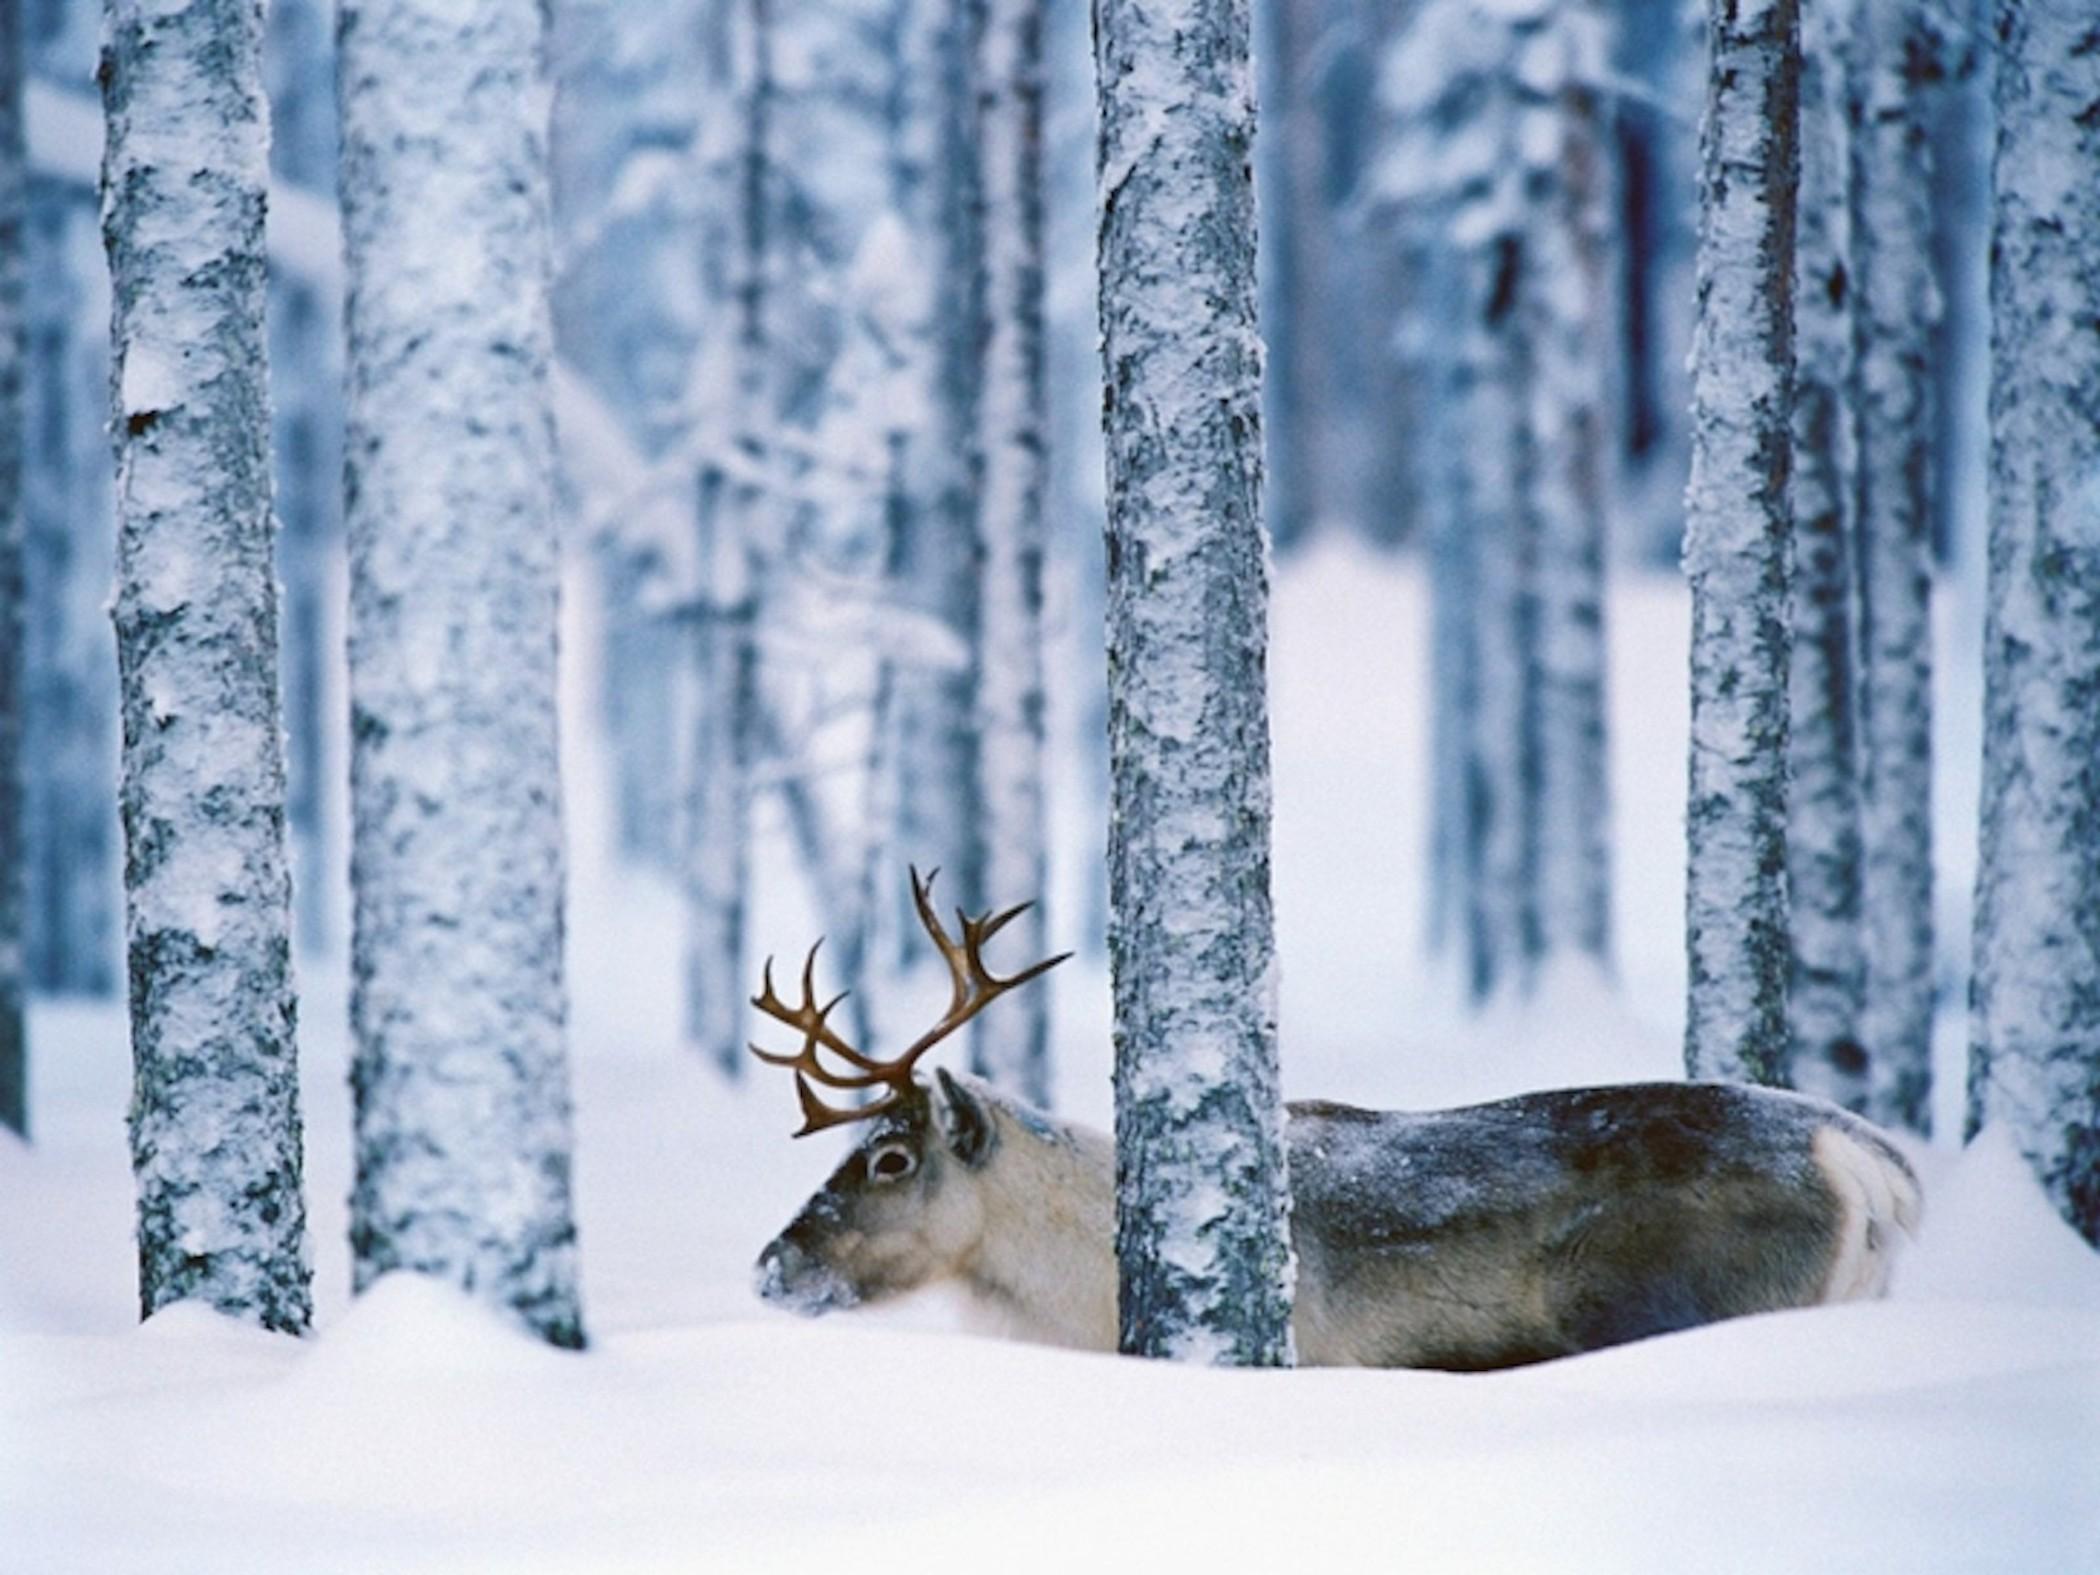 Snow Moose Wallpaper Free Wallpaper Downloads